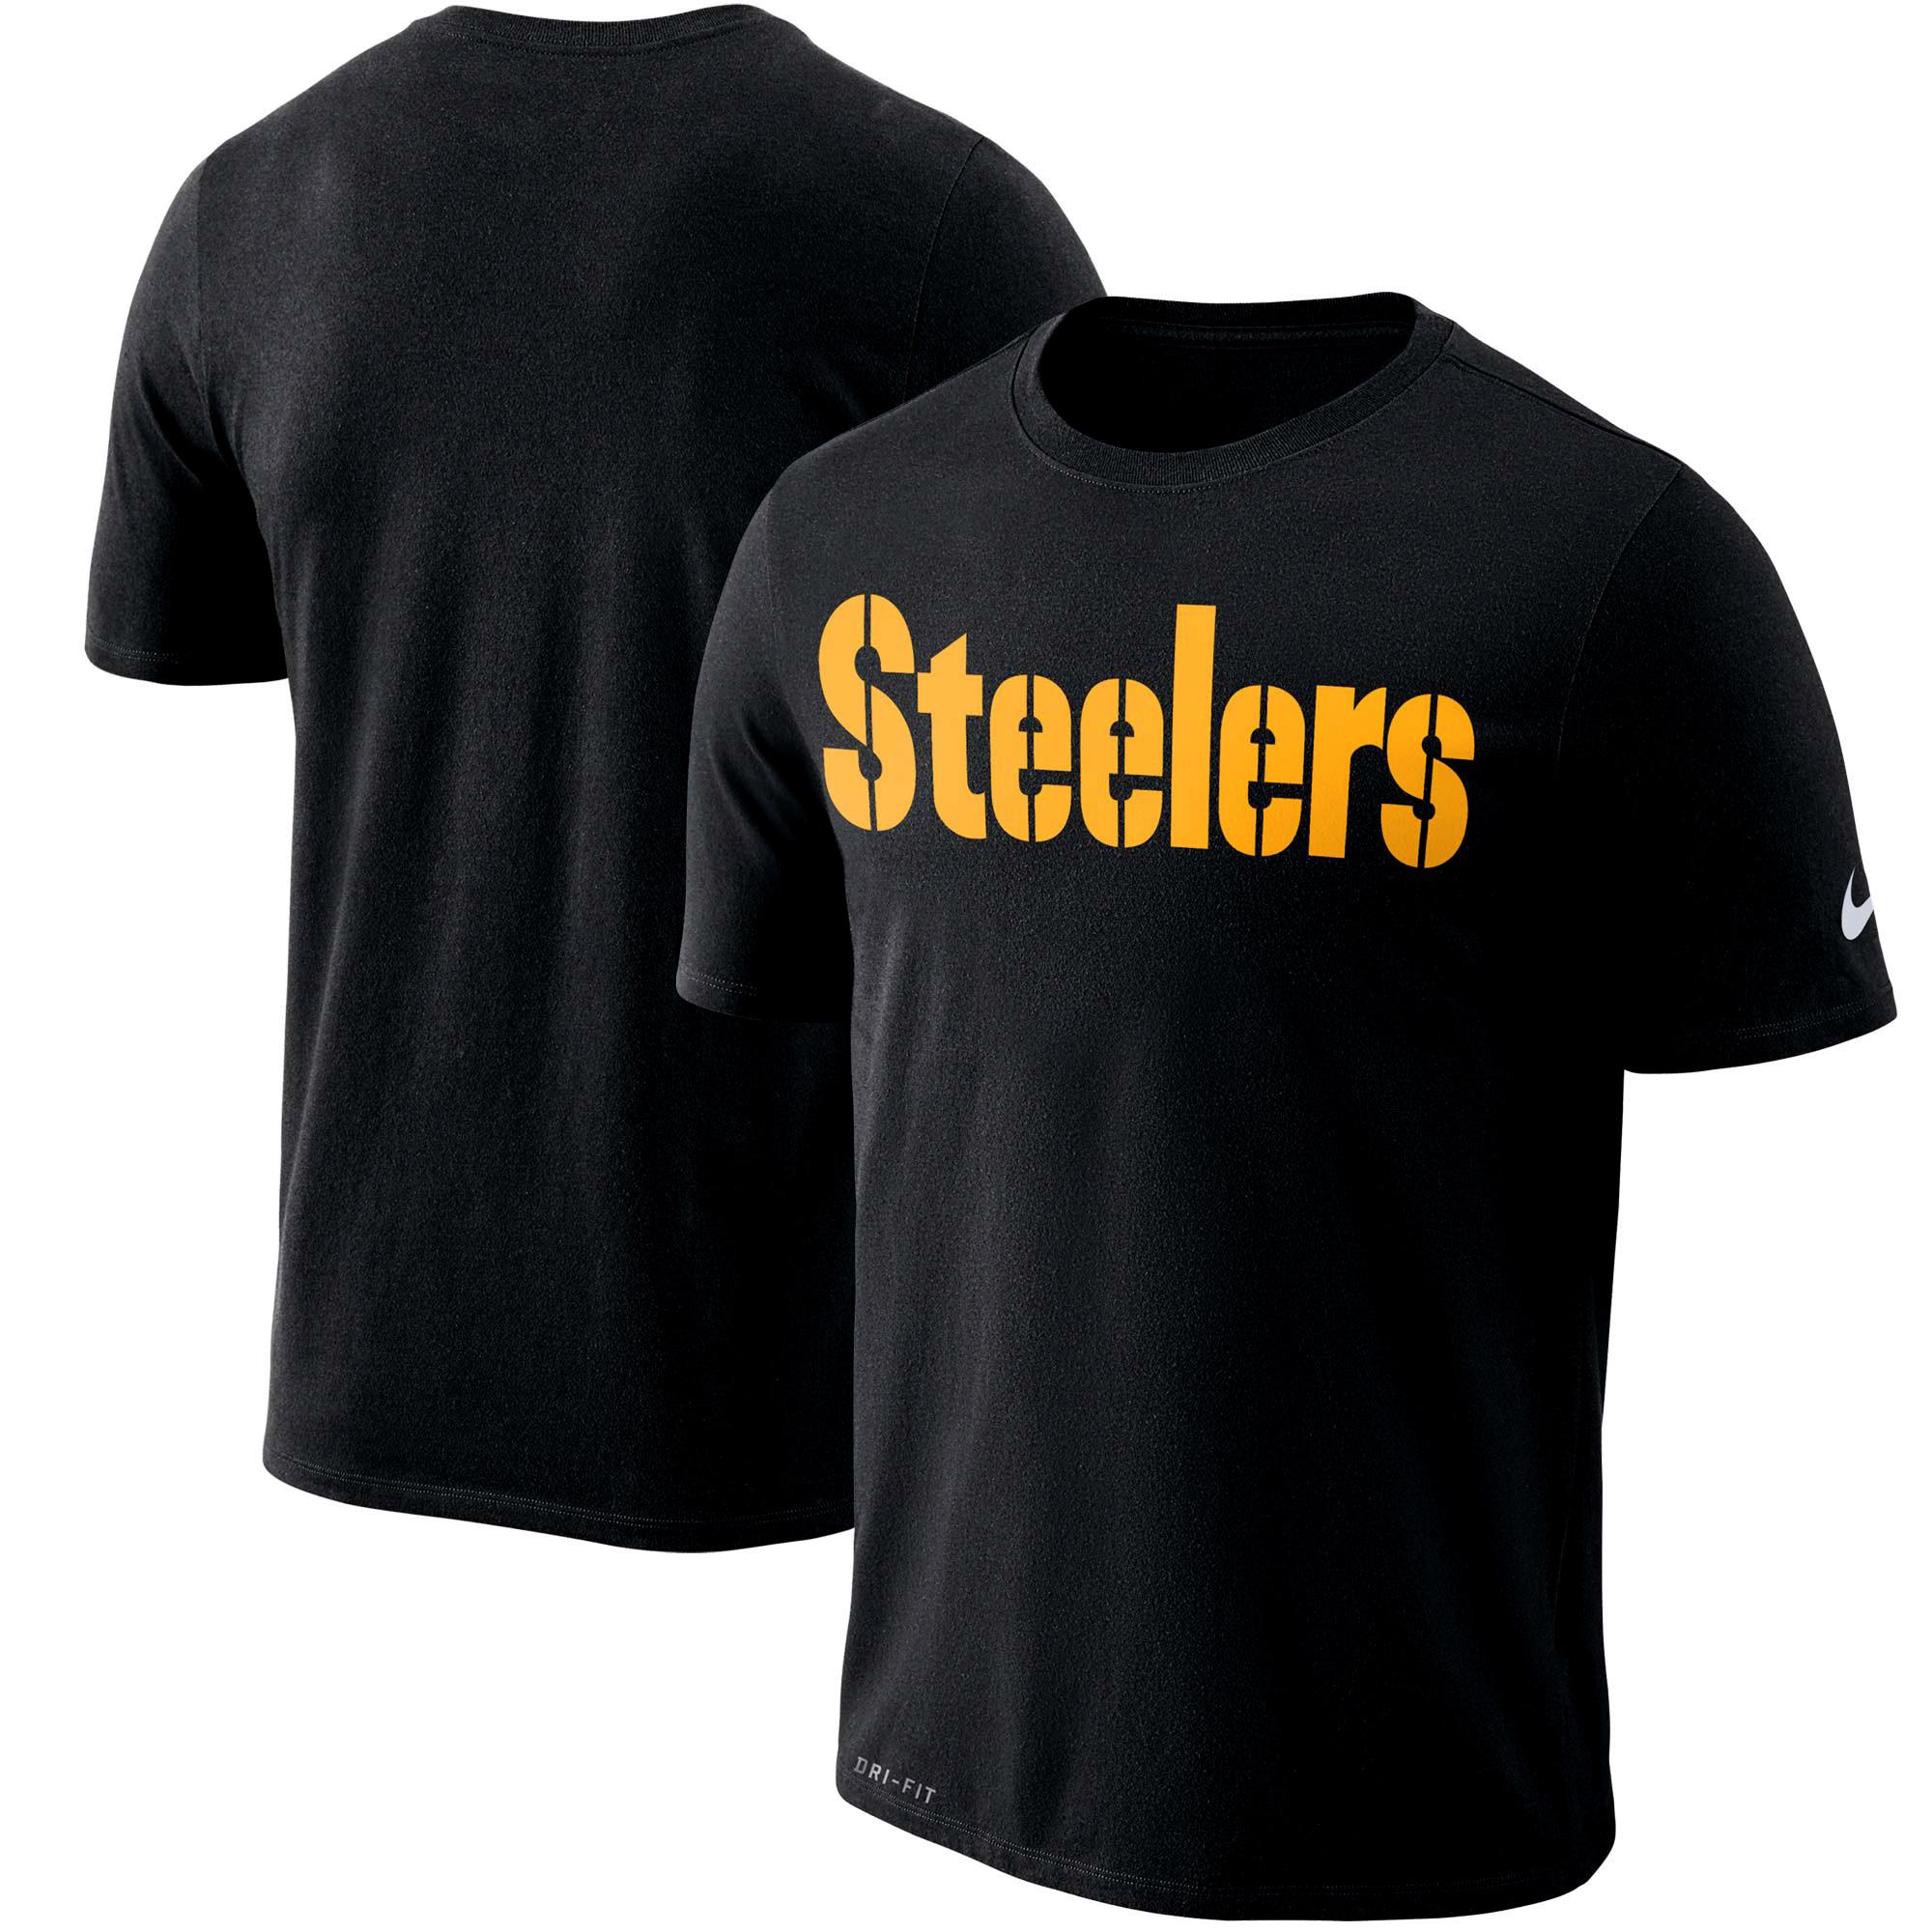 Pittsburgh Steelers Nike Dri-FIT Cotton Essential Wordmark Performance T-Shirt - Black